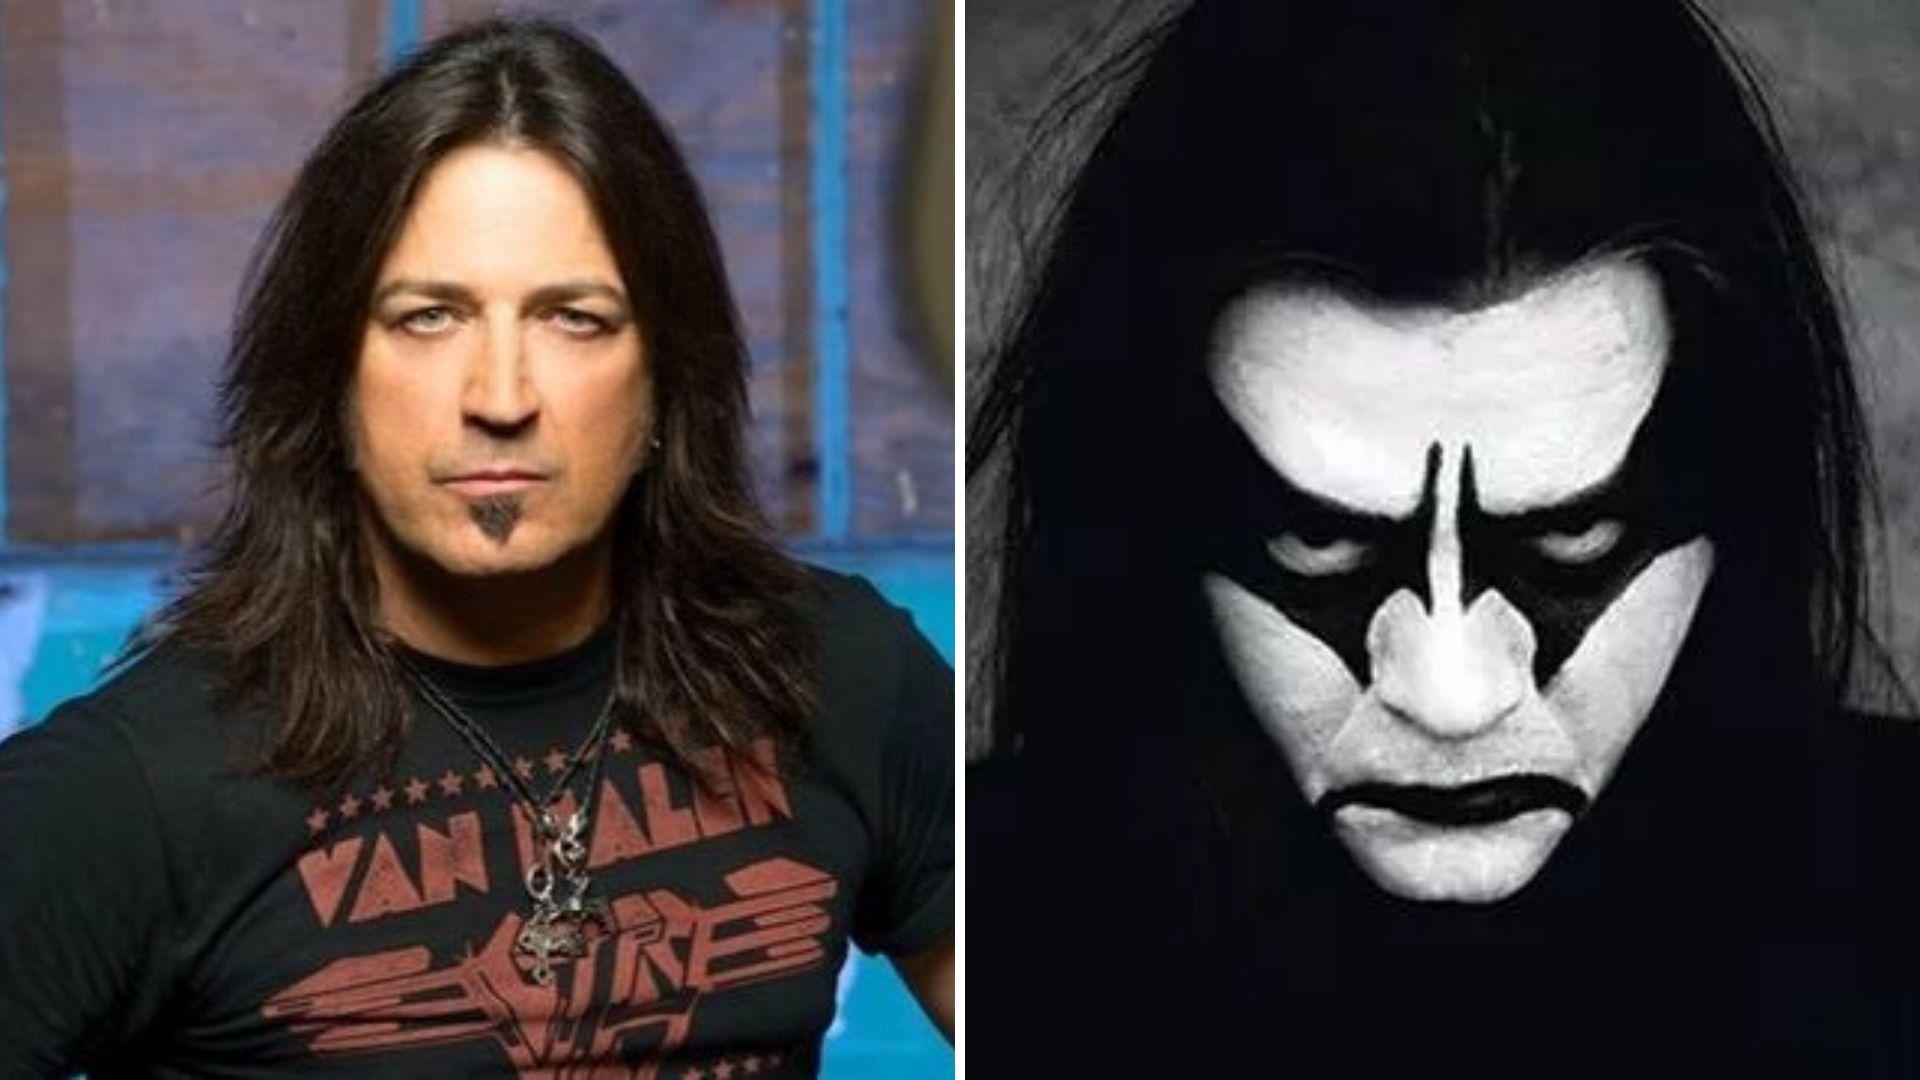 banda cristiana stryper black metal